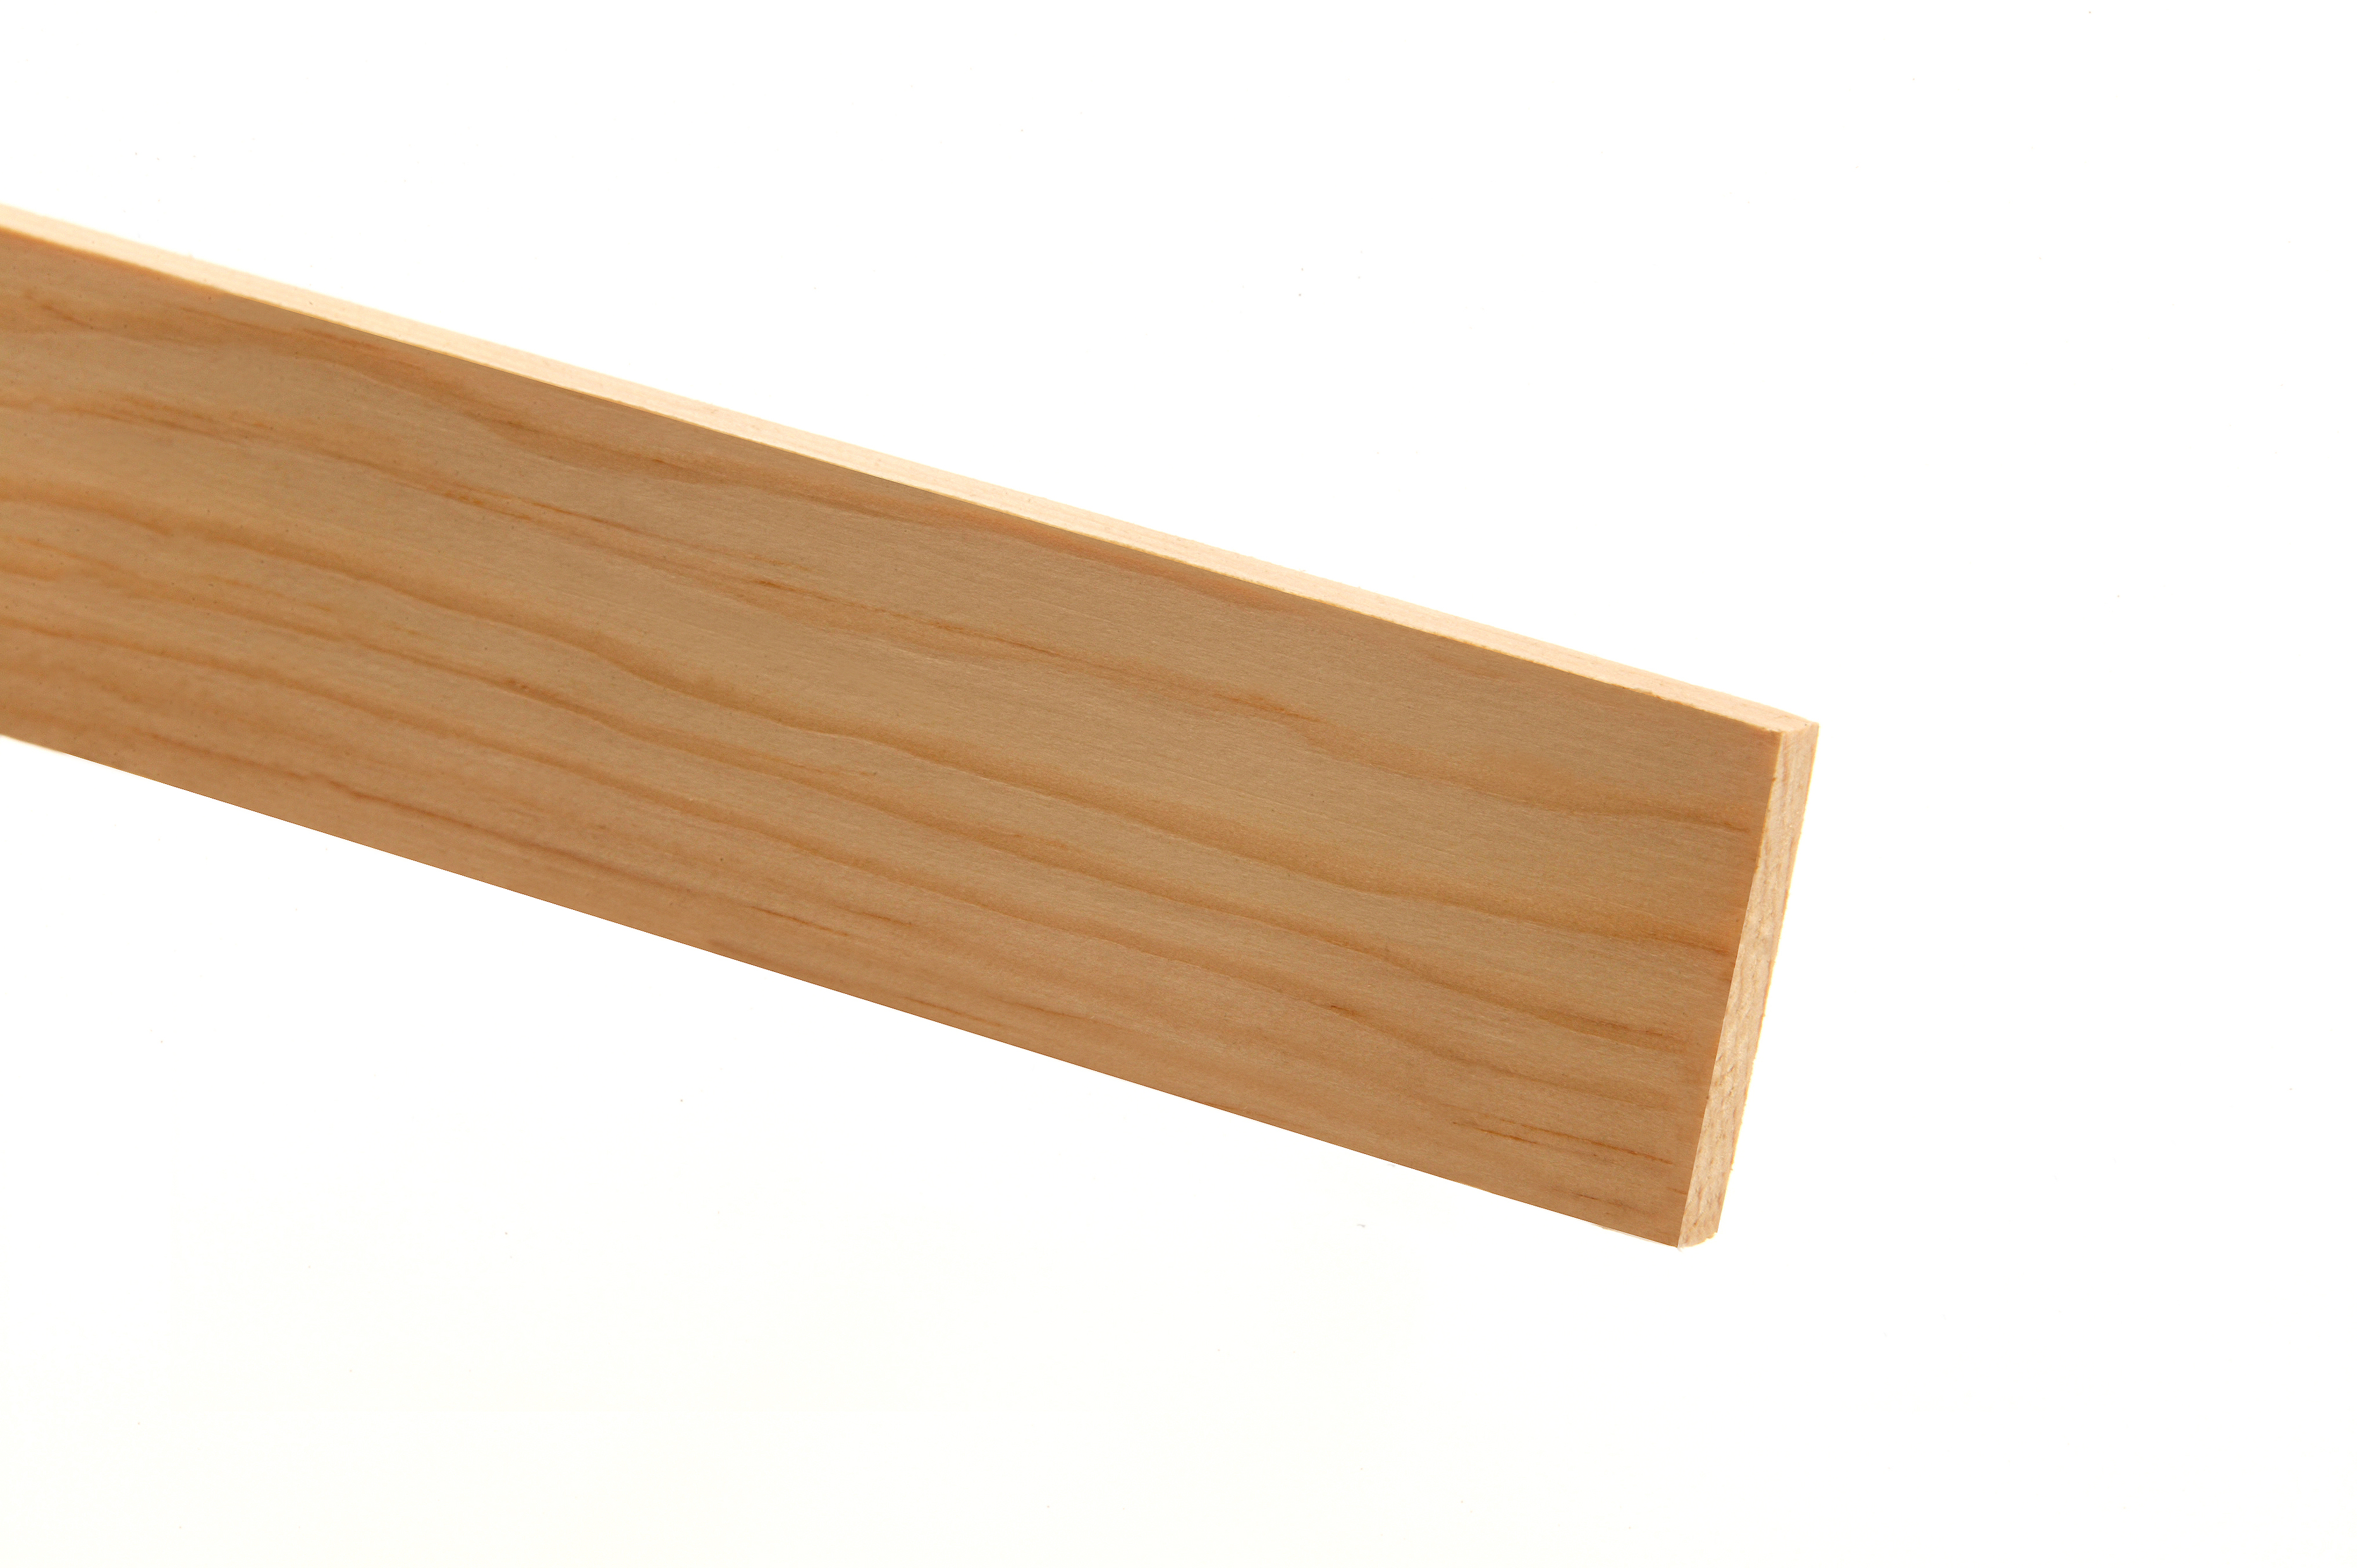 20 Pine PSE Stripwood 12 x 25 x 2400mm